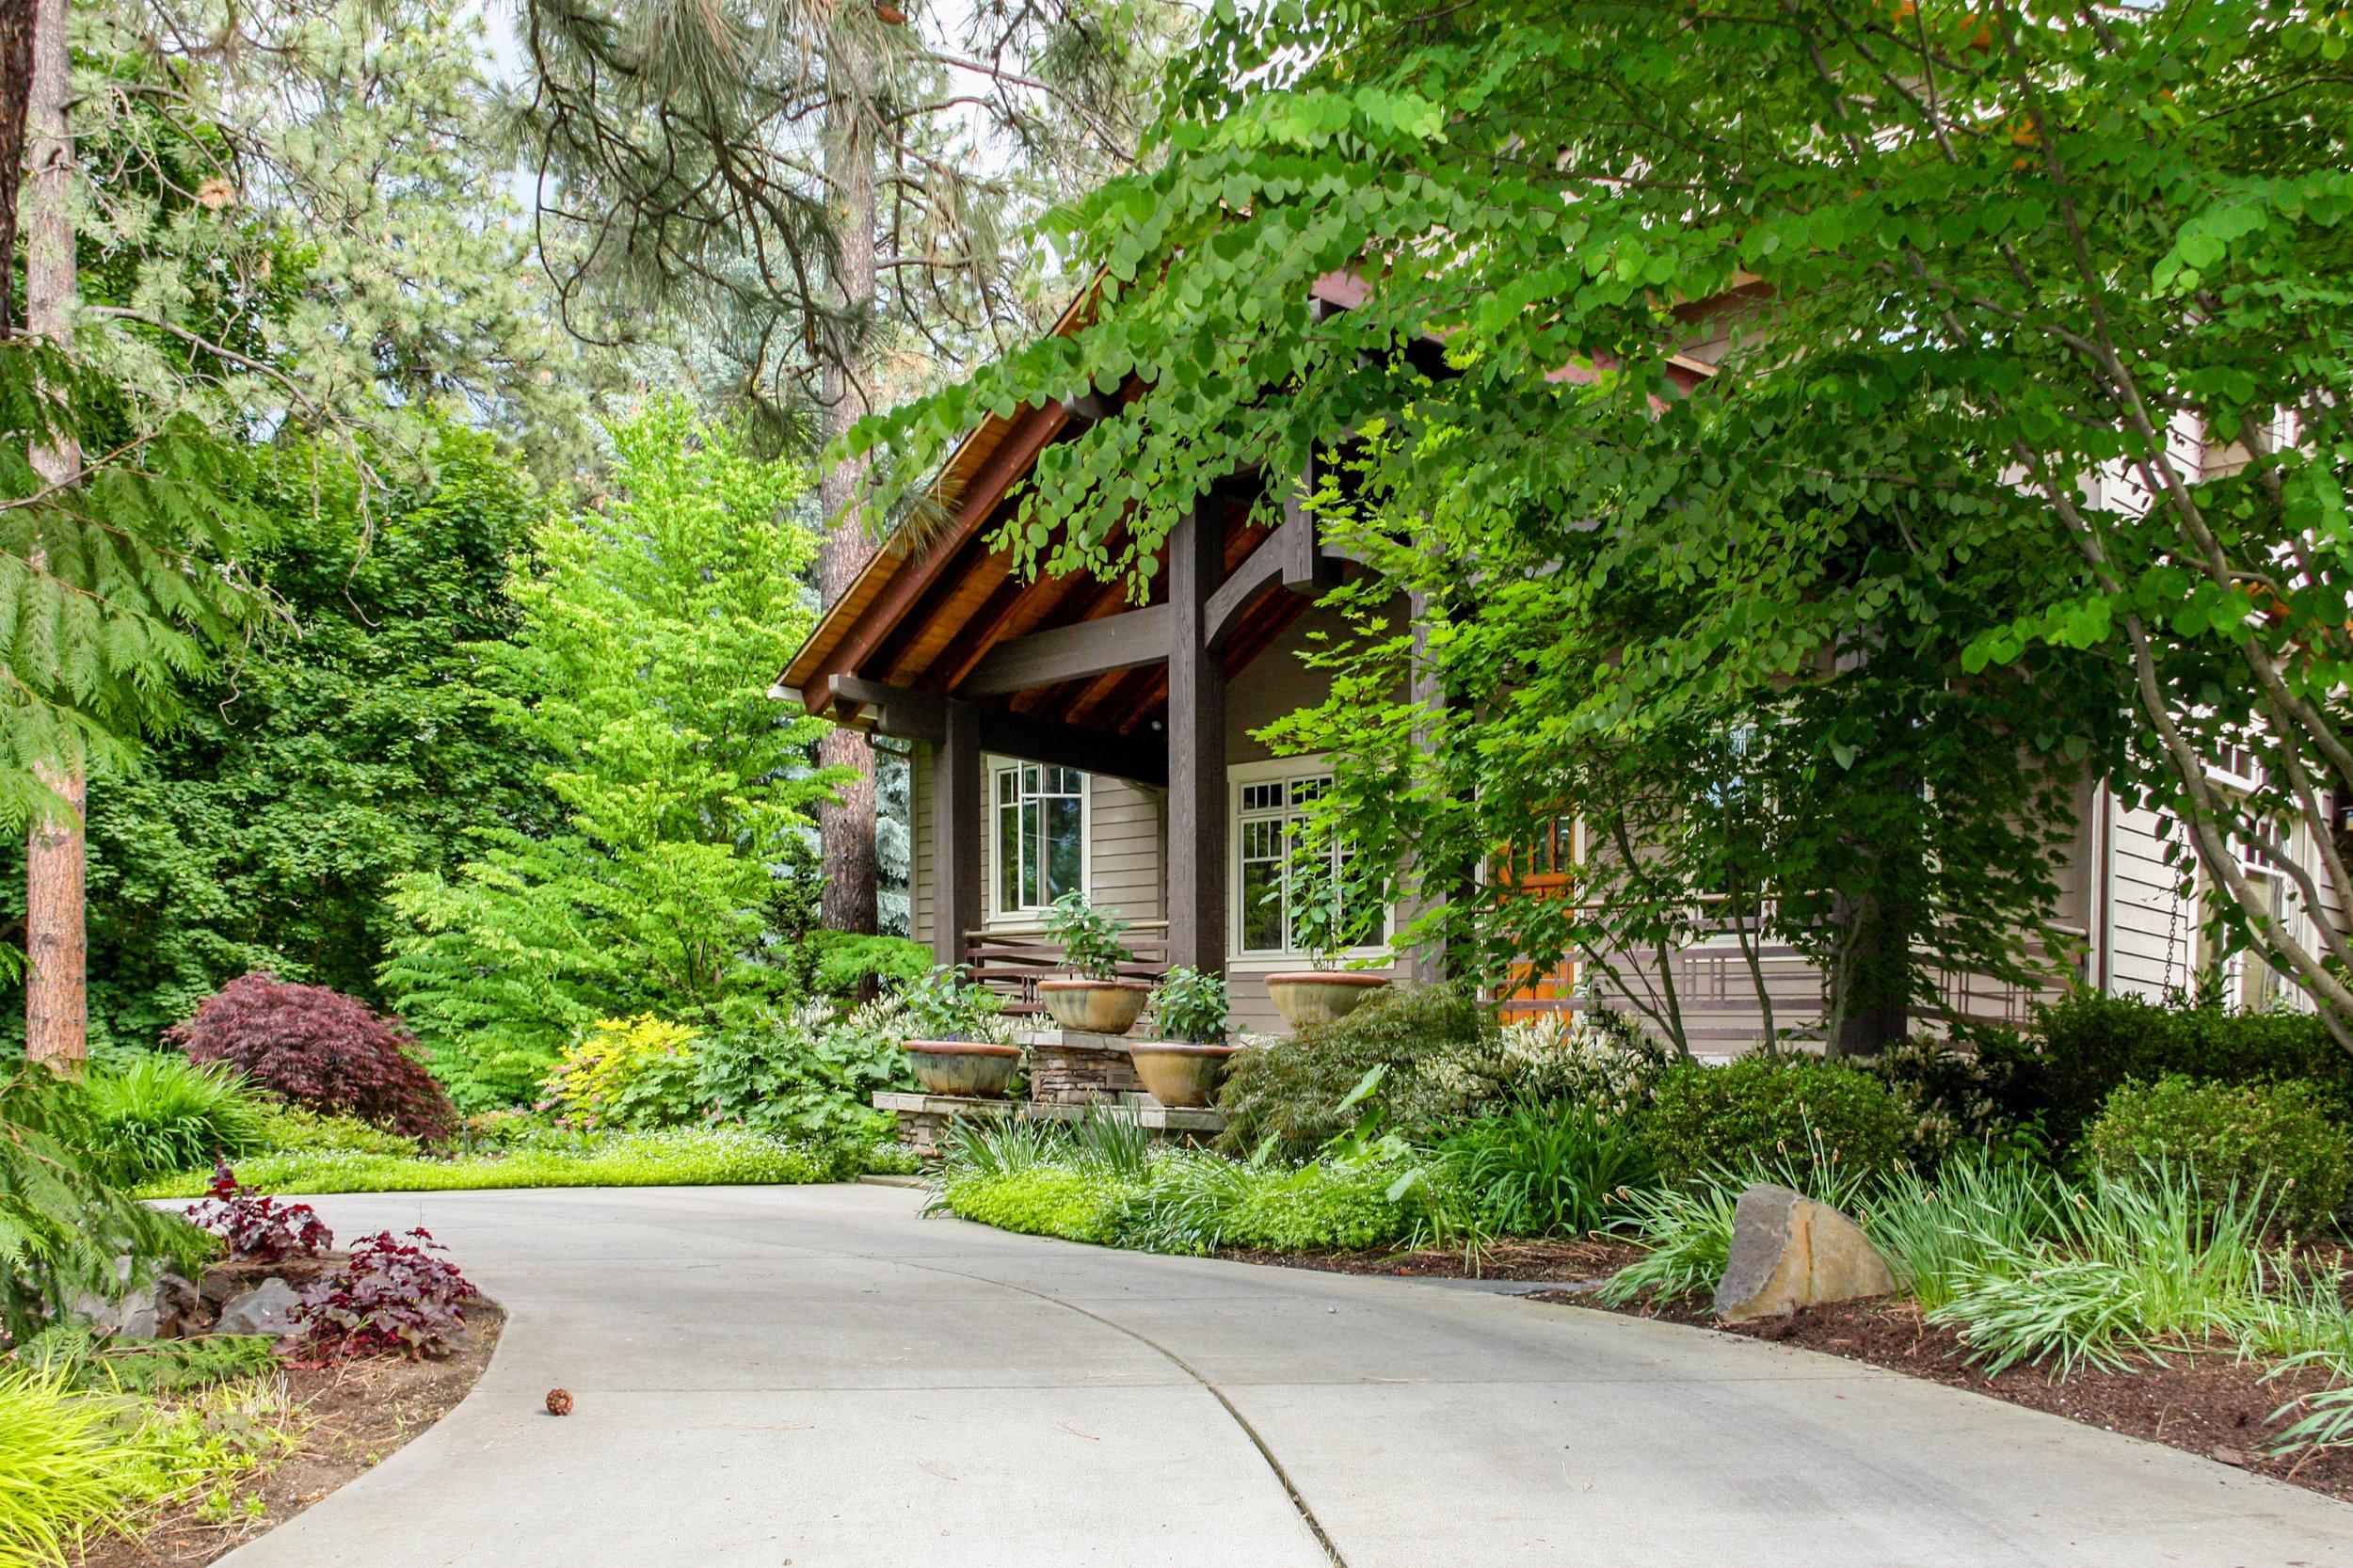 Rockwood Craftsman Spokane Landscape Design Pacific Garden Design